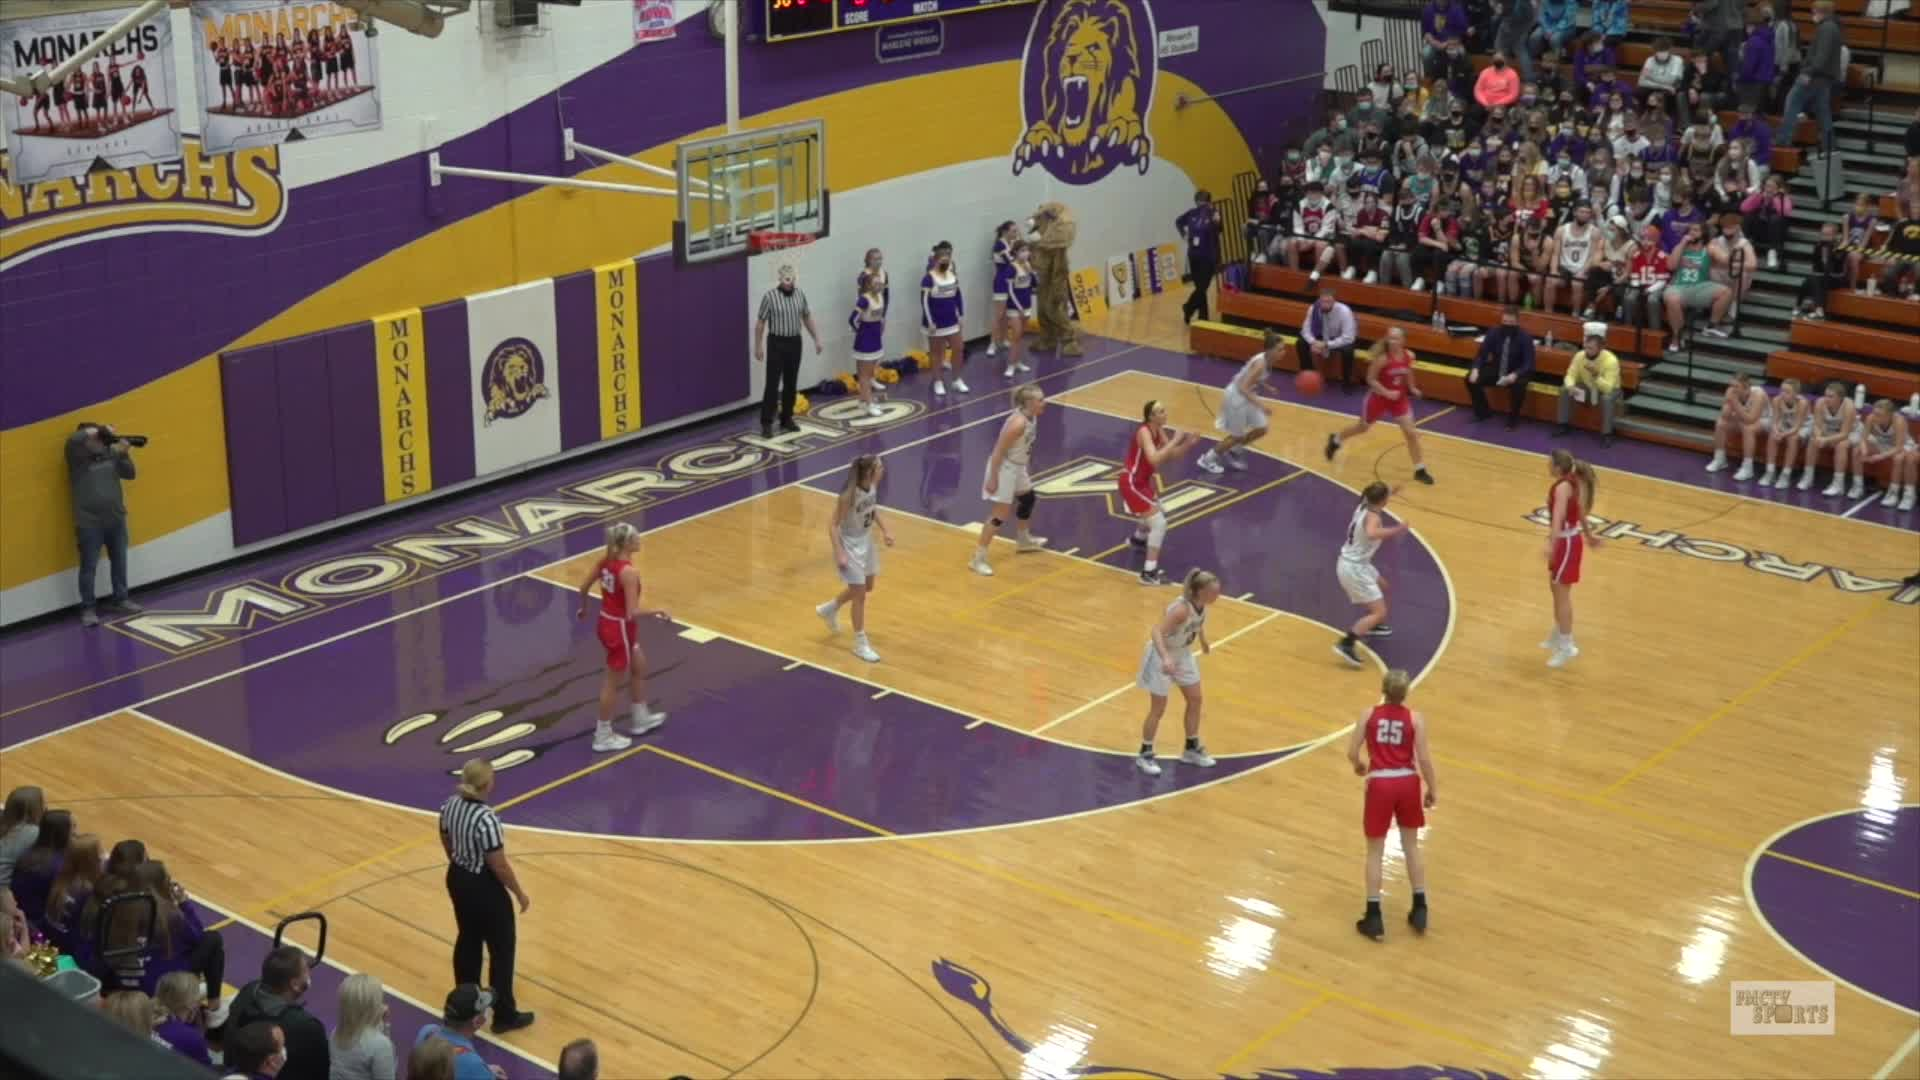 2020 HCHS Girls Basketball State Tournament Hype Video